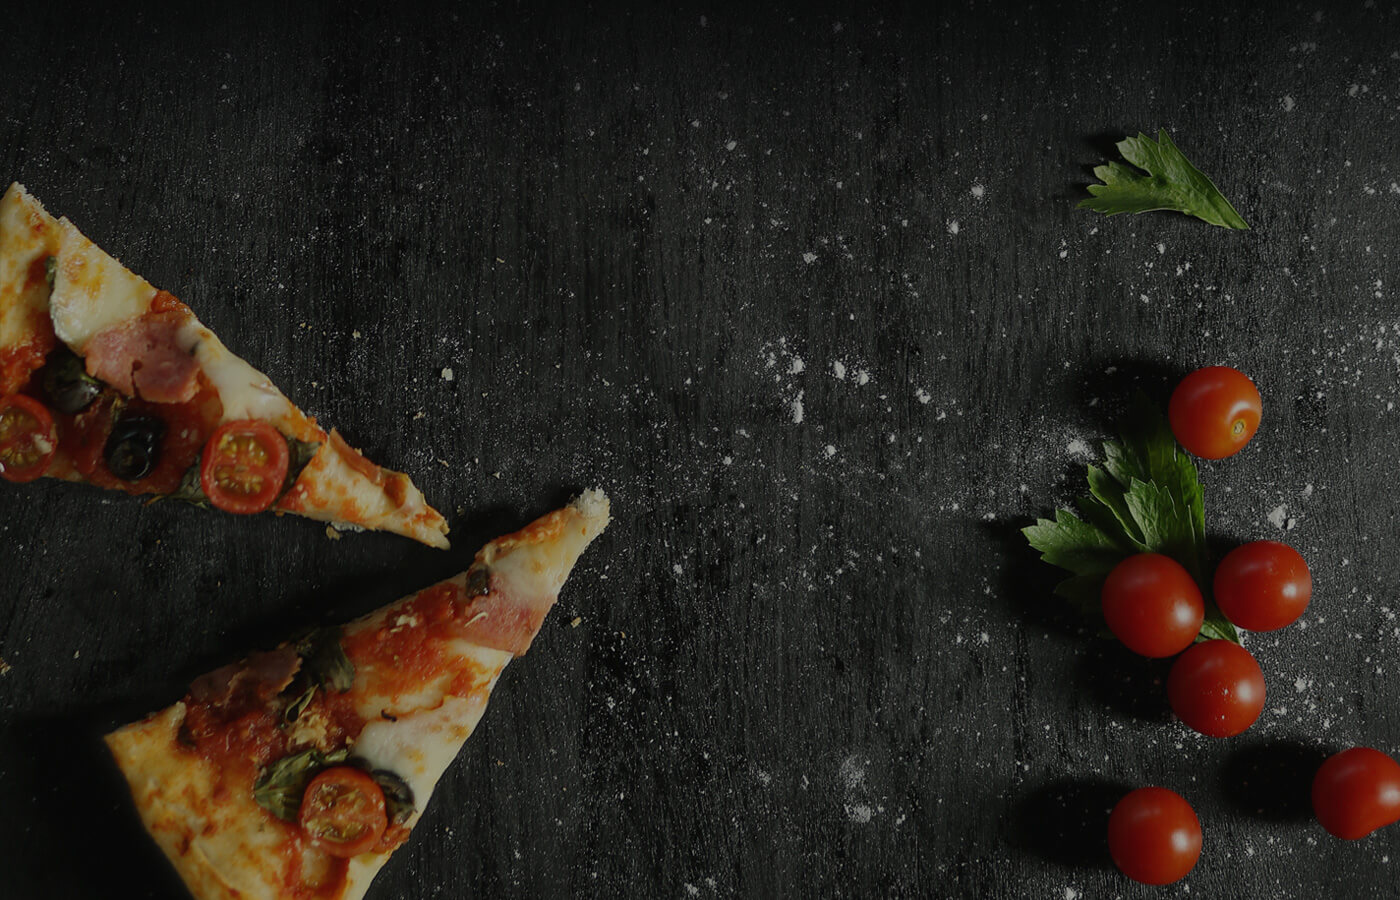 Holzofen Pizza München Forstenried